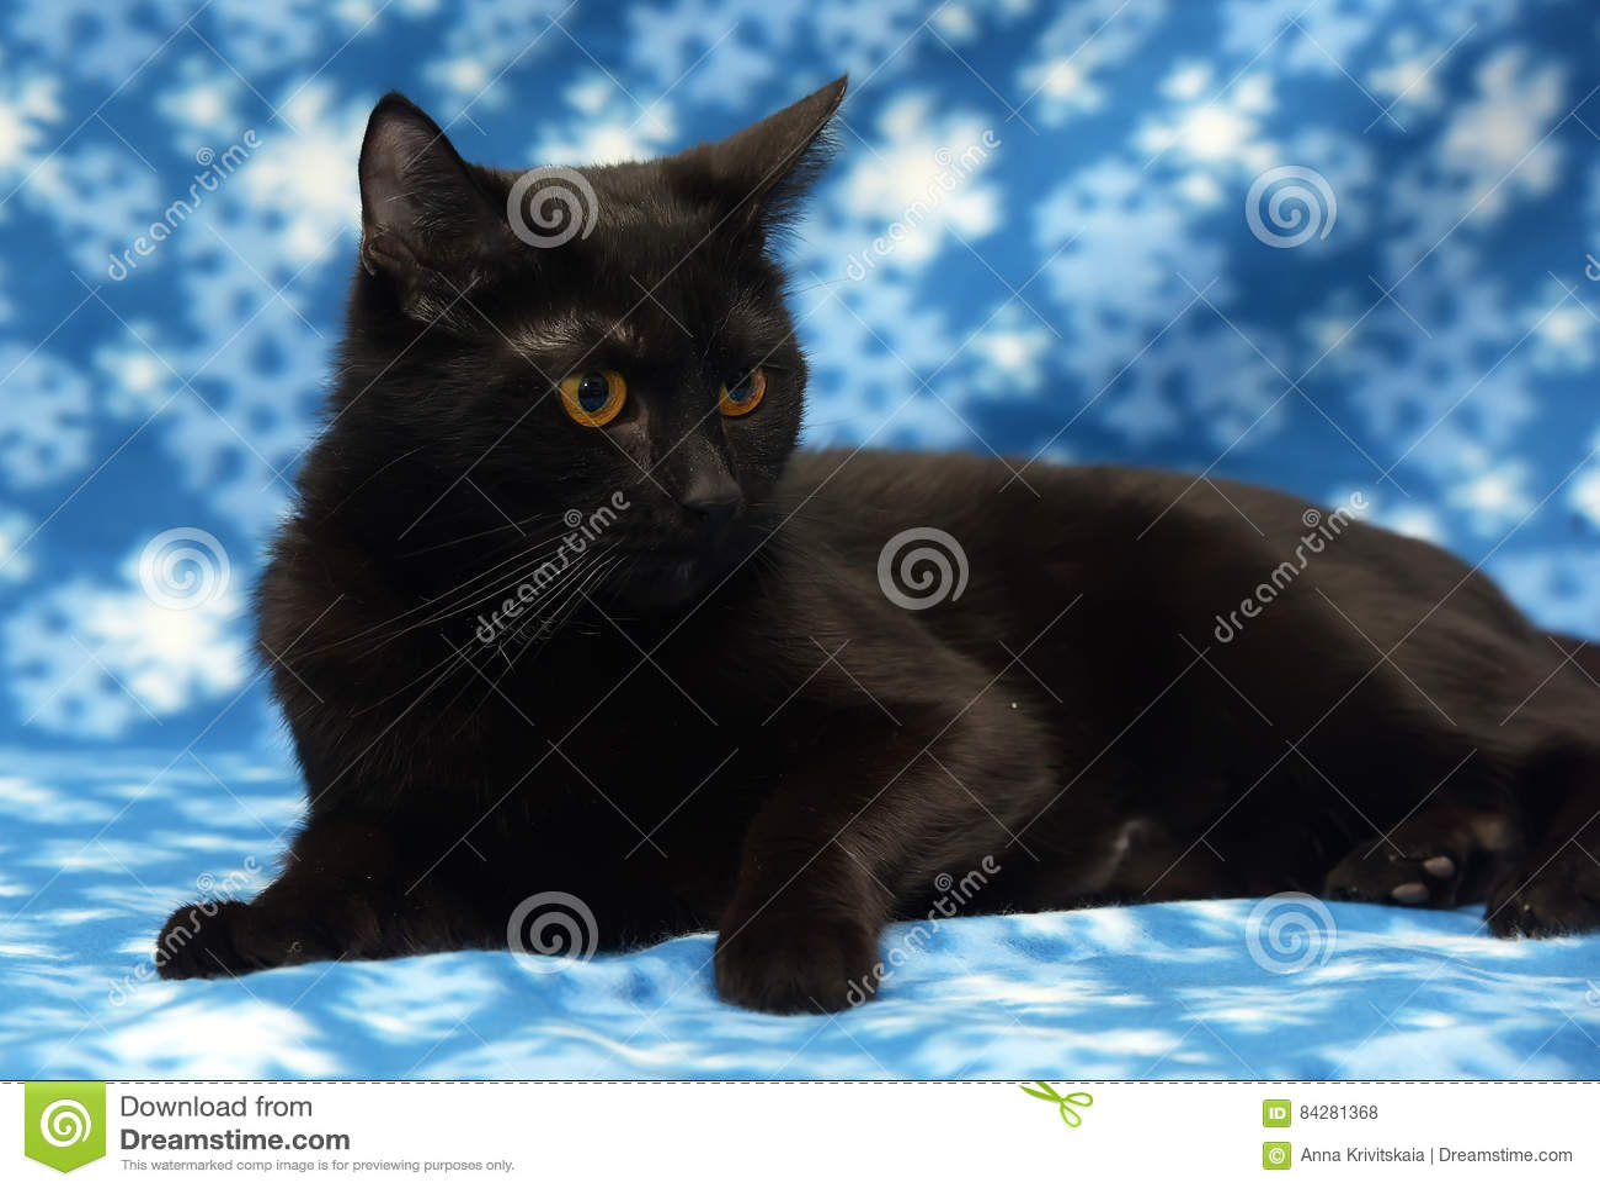 harry potter cat costume